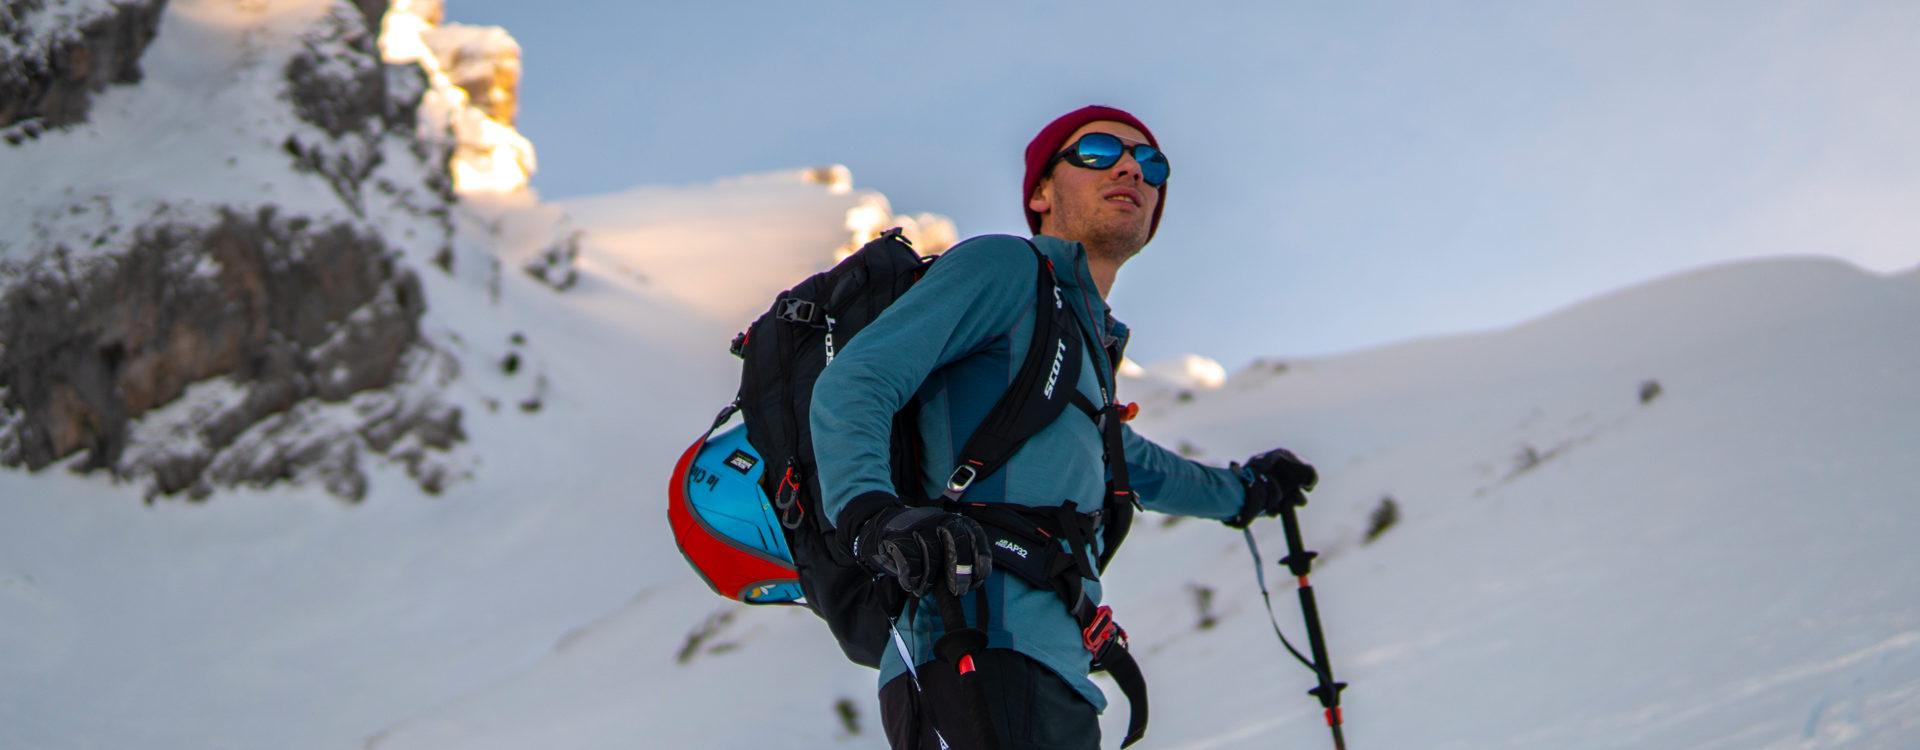 Annecy : 5 parcours ski de rando